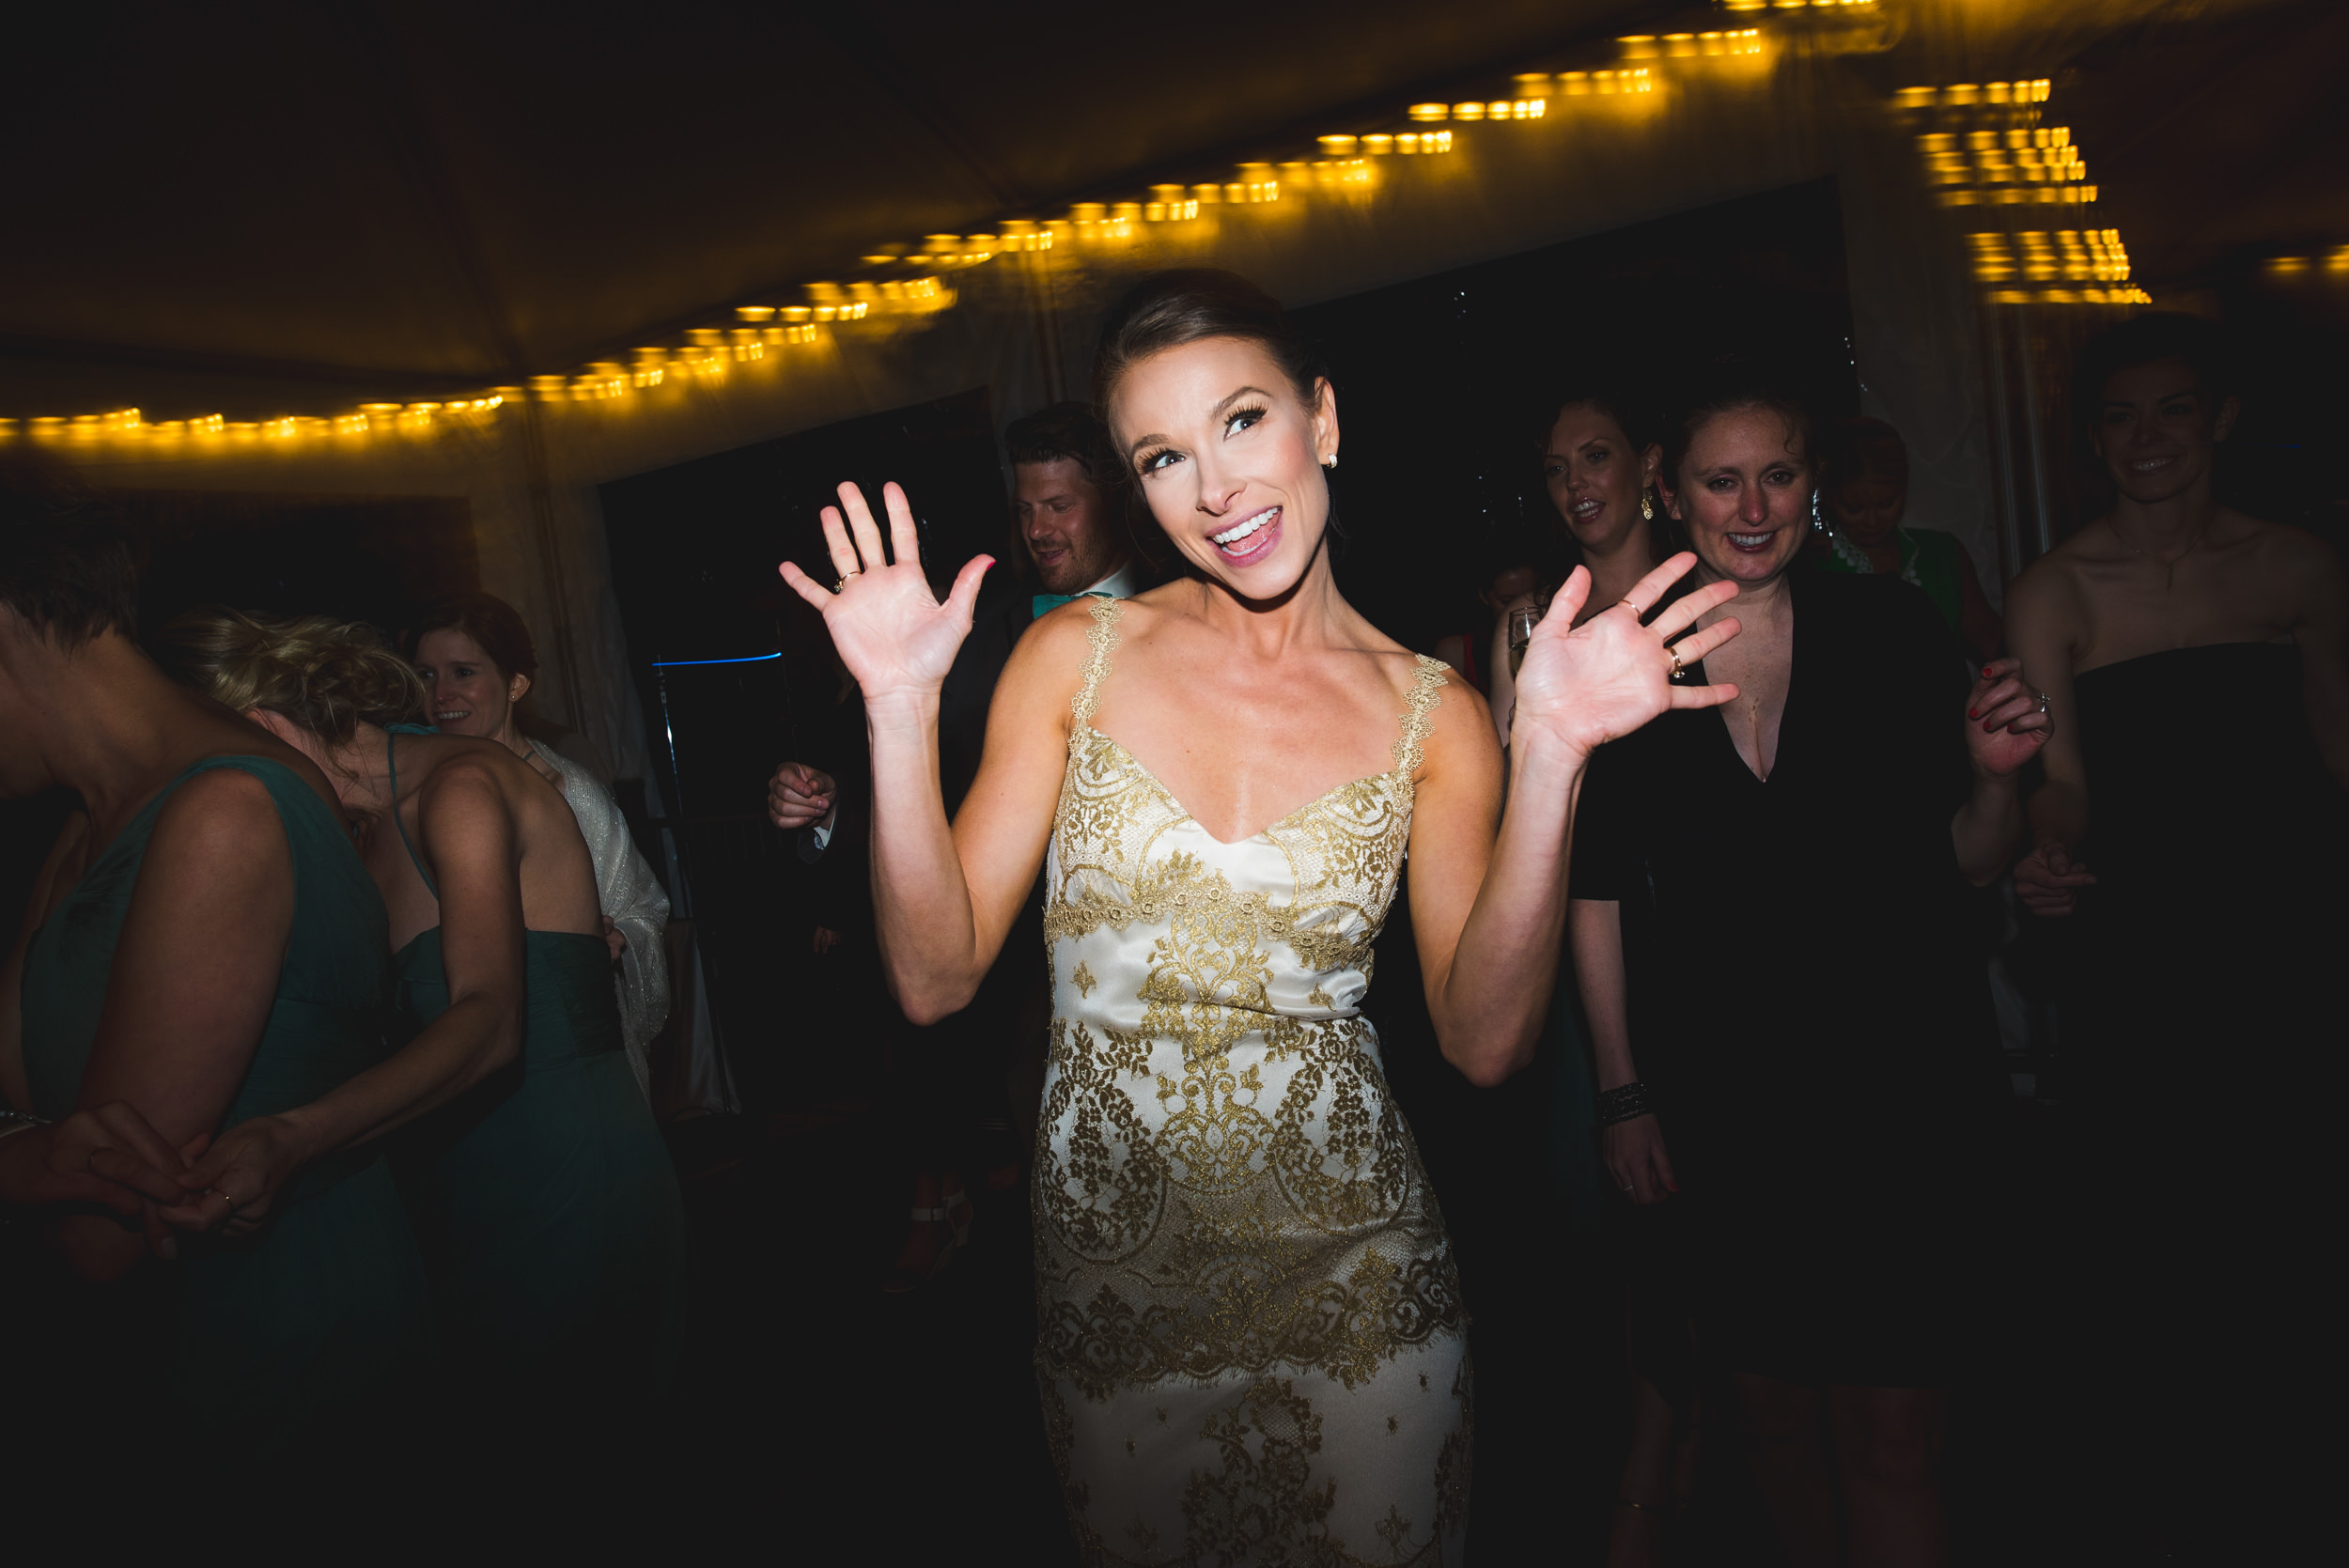 Philip Merrill Environmental Center wedding-27.jpg